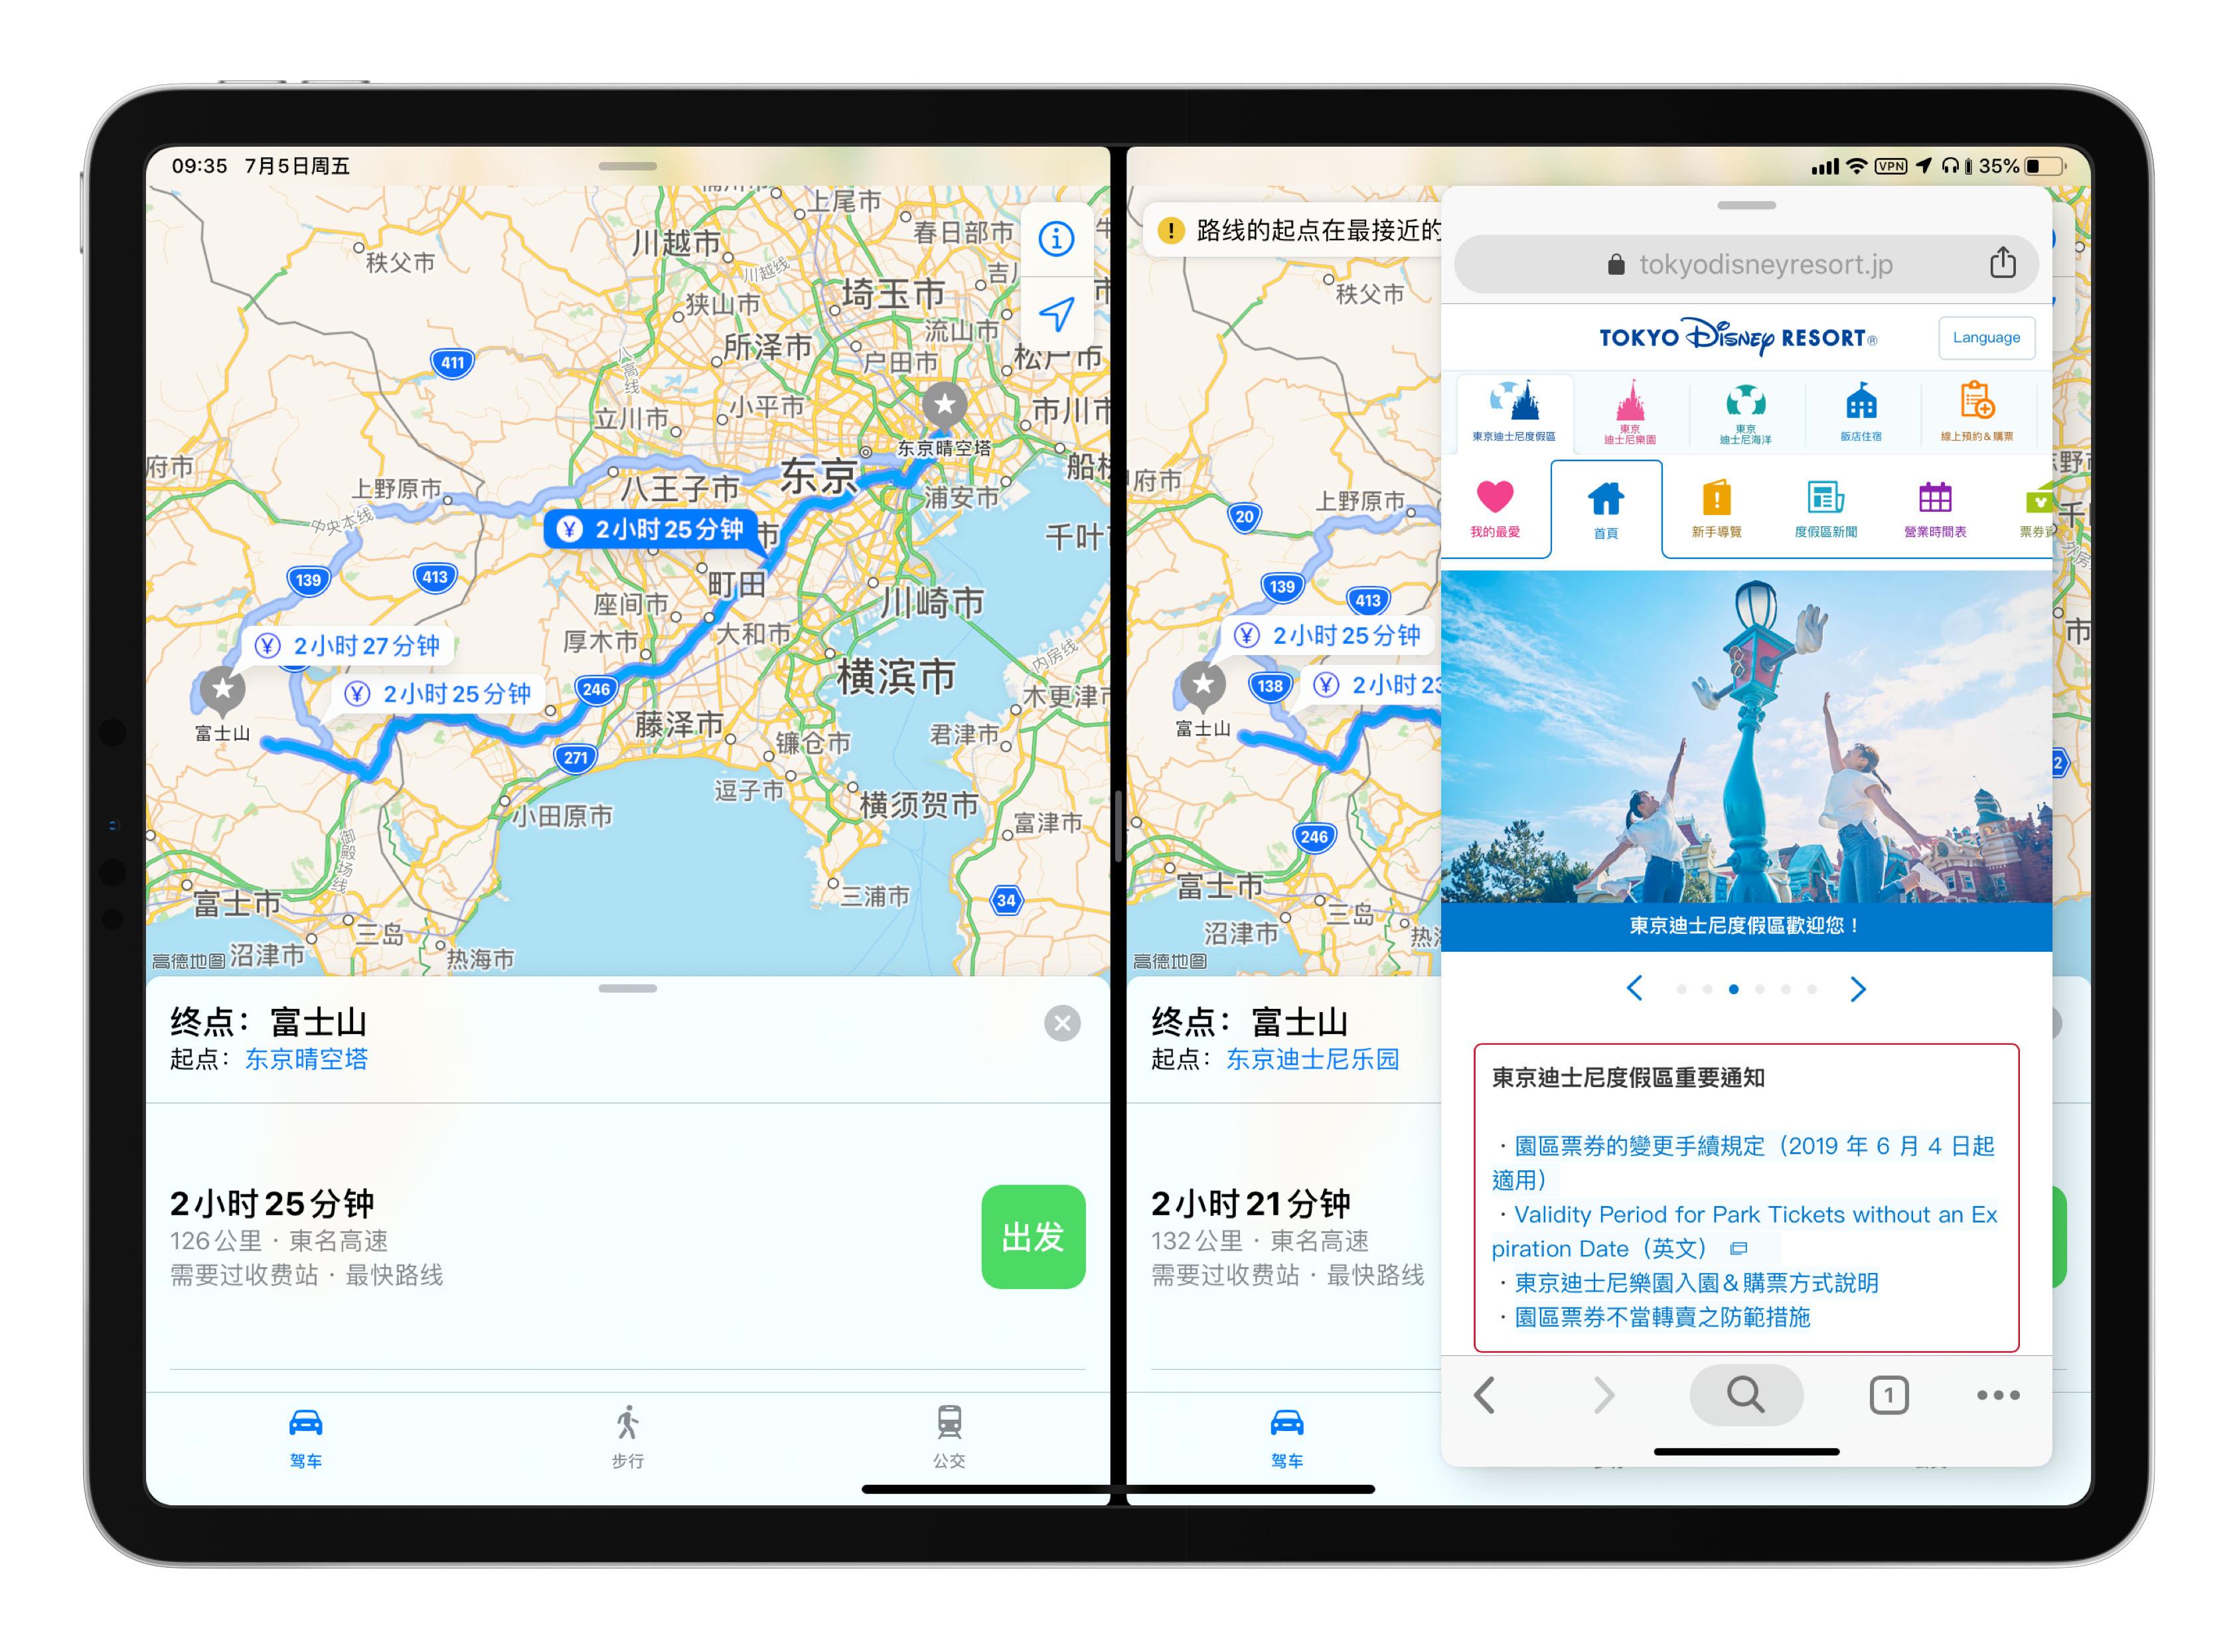 iPadOS体验:更强的多任务功能的照片 - 5